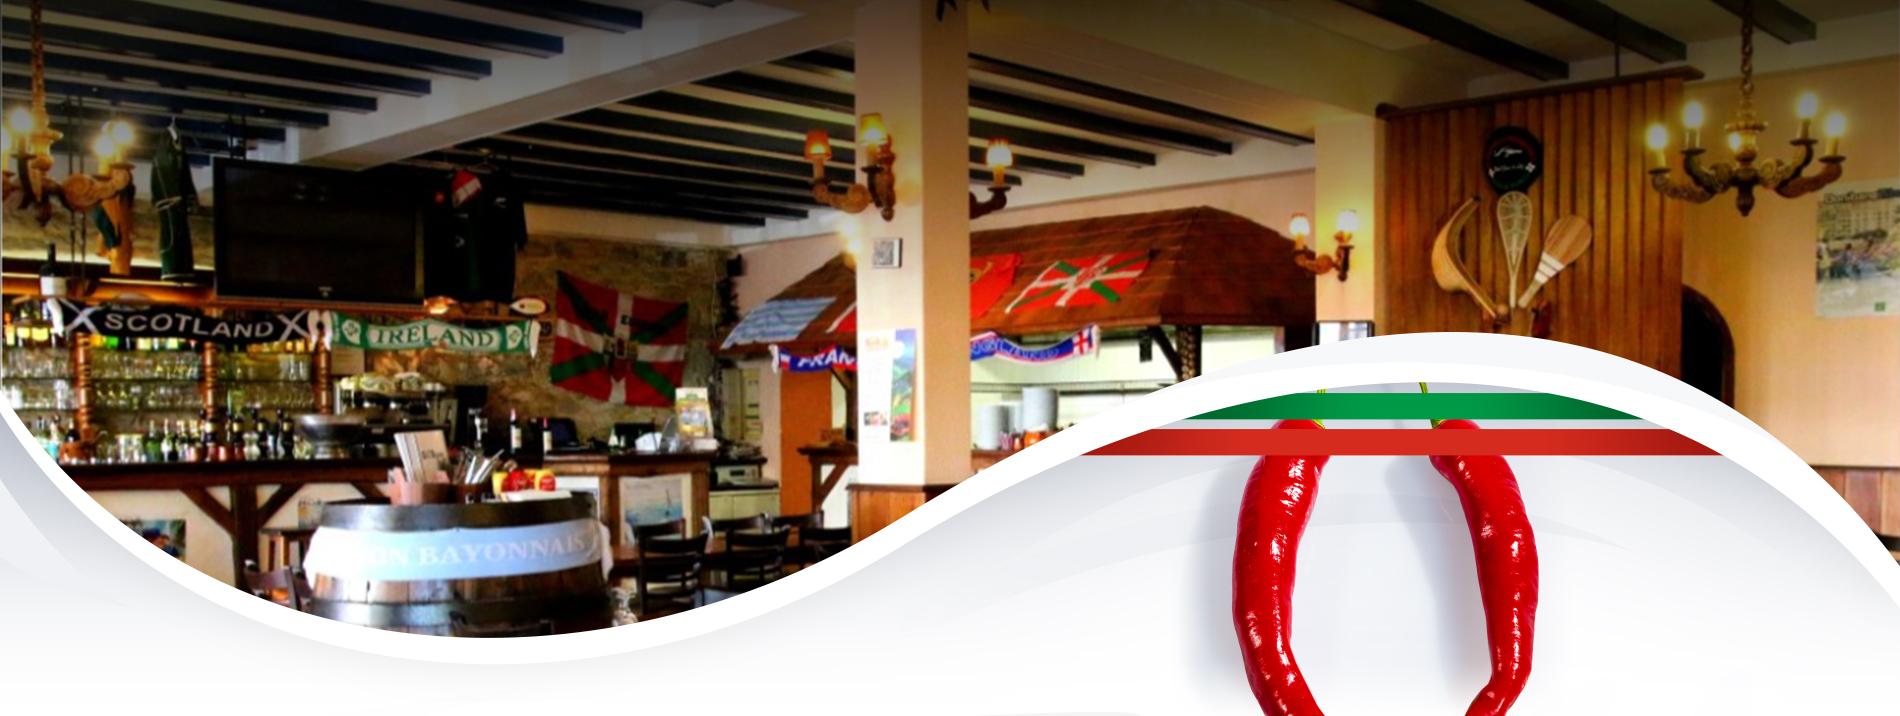 Cuisine basque saint jean de luz le grand grill basque - Buffalo grill accepte les cheques vacances ...